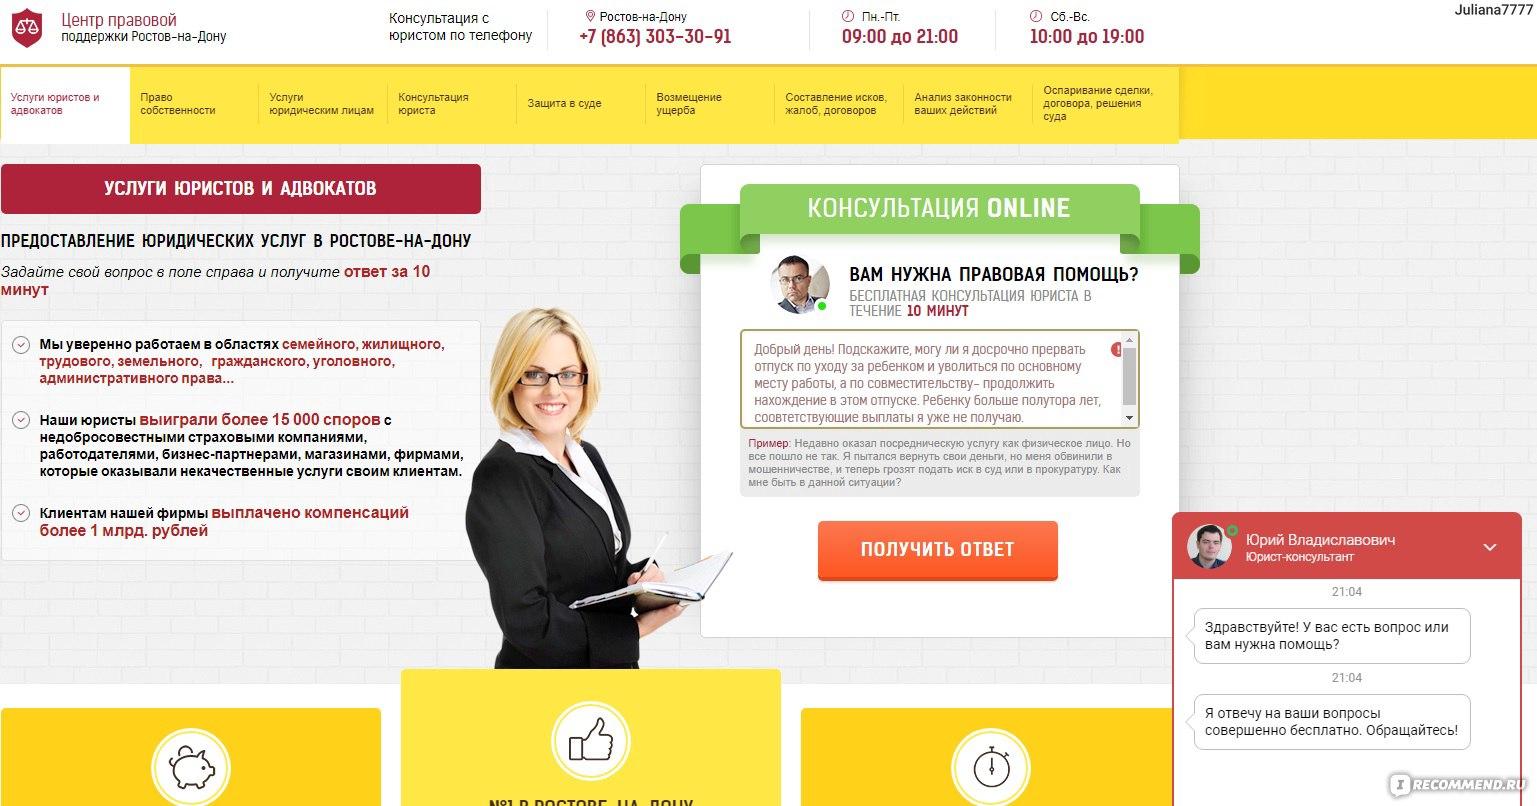 Консультация юриста бесплатно онлайн круглосуточно краснодар